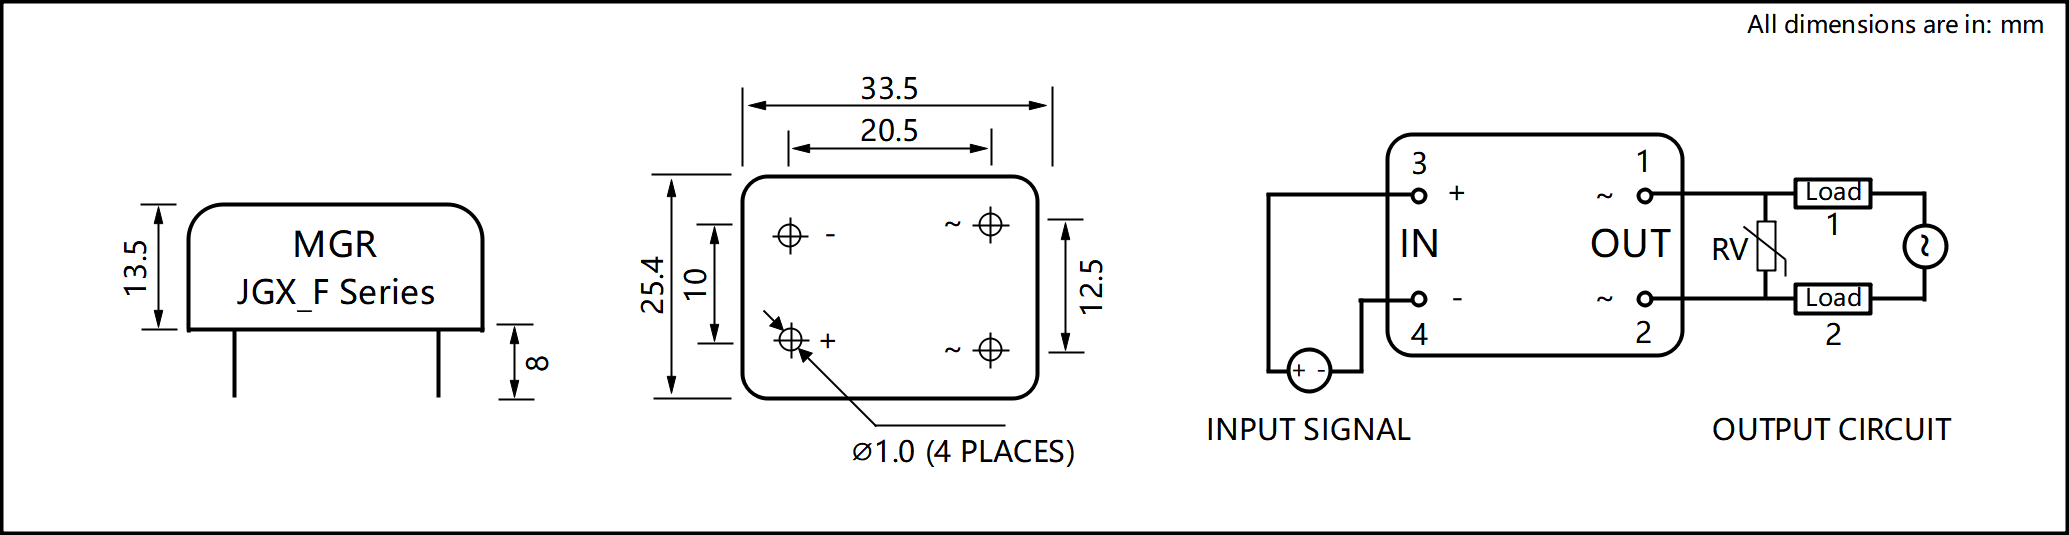 JGX_F Series Metal Housing PCB Mount Solid State Relay Circuit Wring Diagram